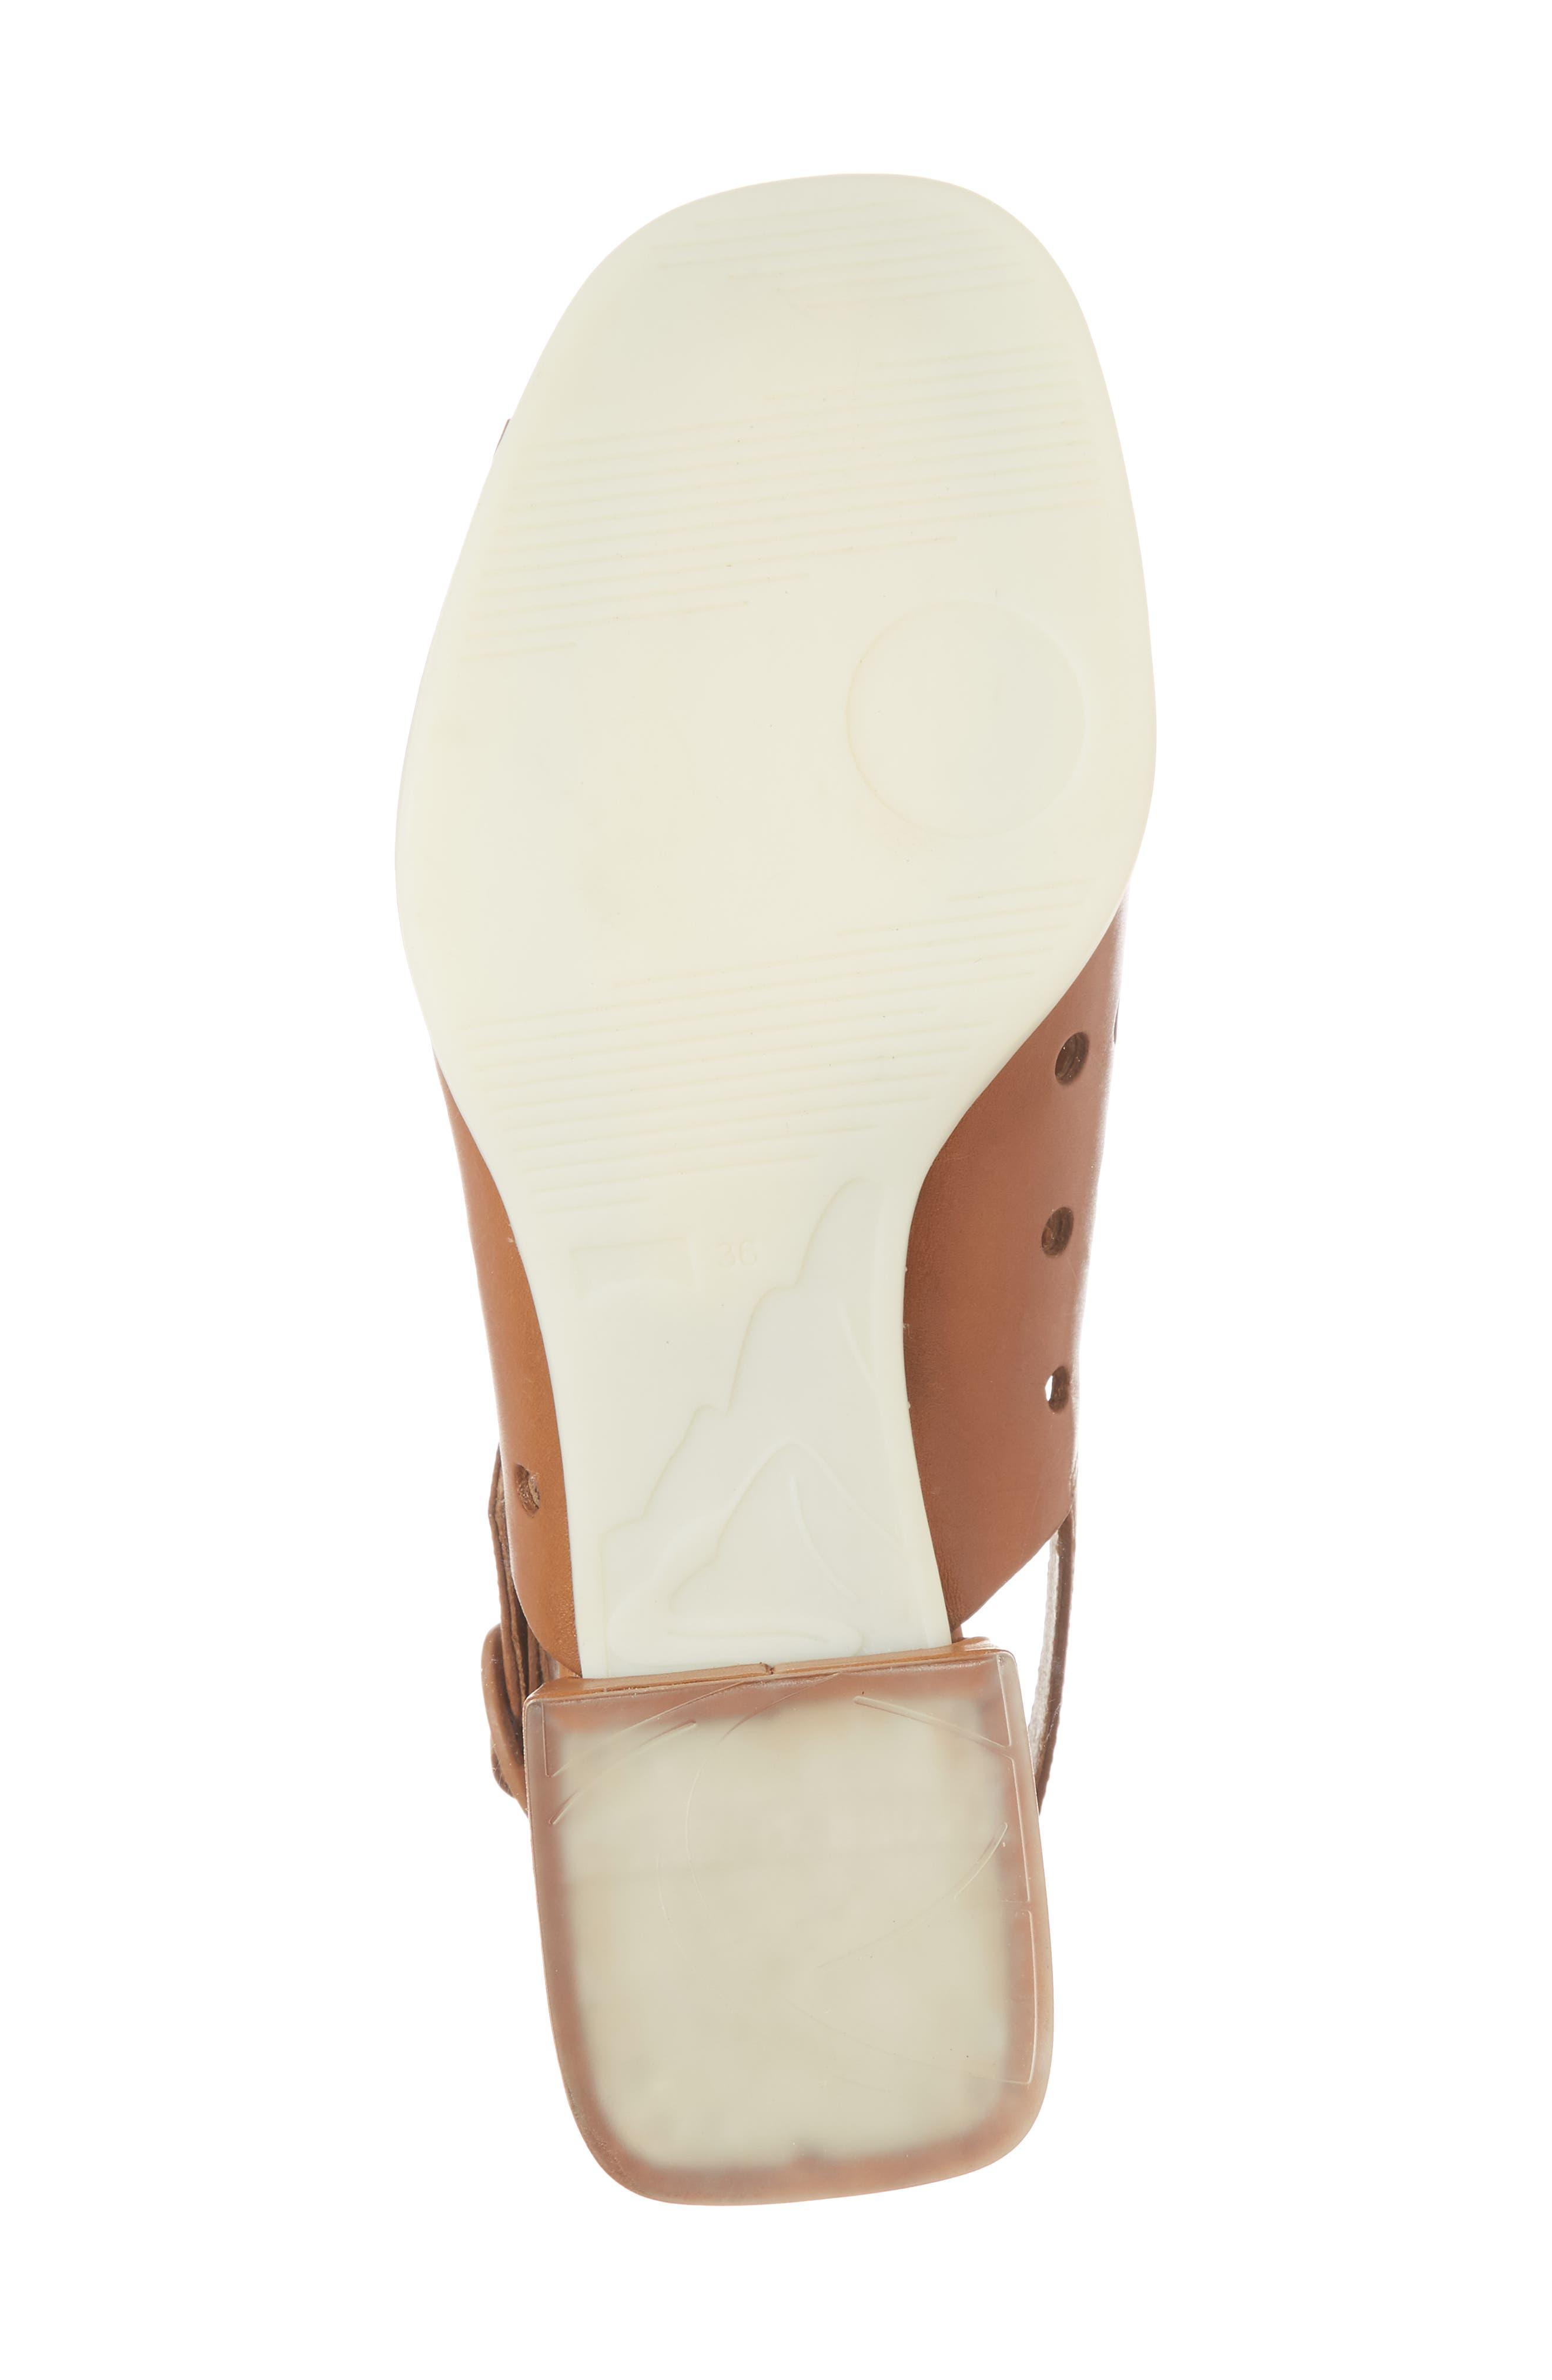 Twins Sandal,                             Alternate thumbnail 6, color,                             Rust/ Copper Leather